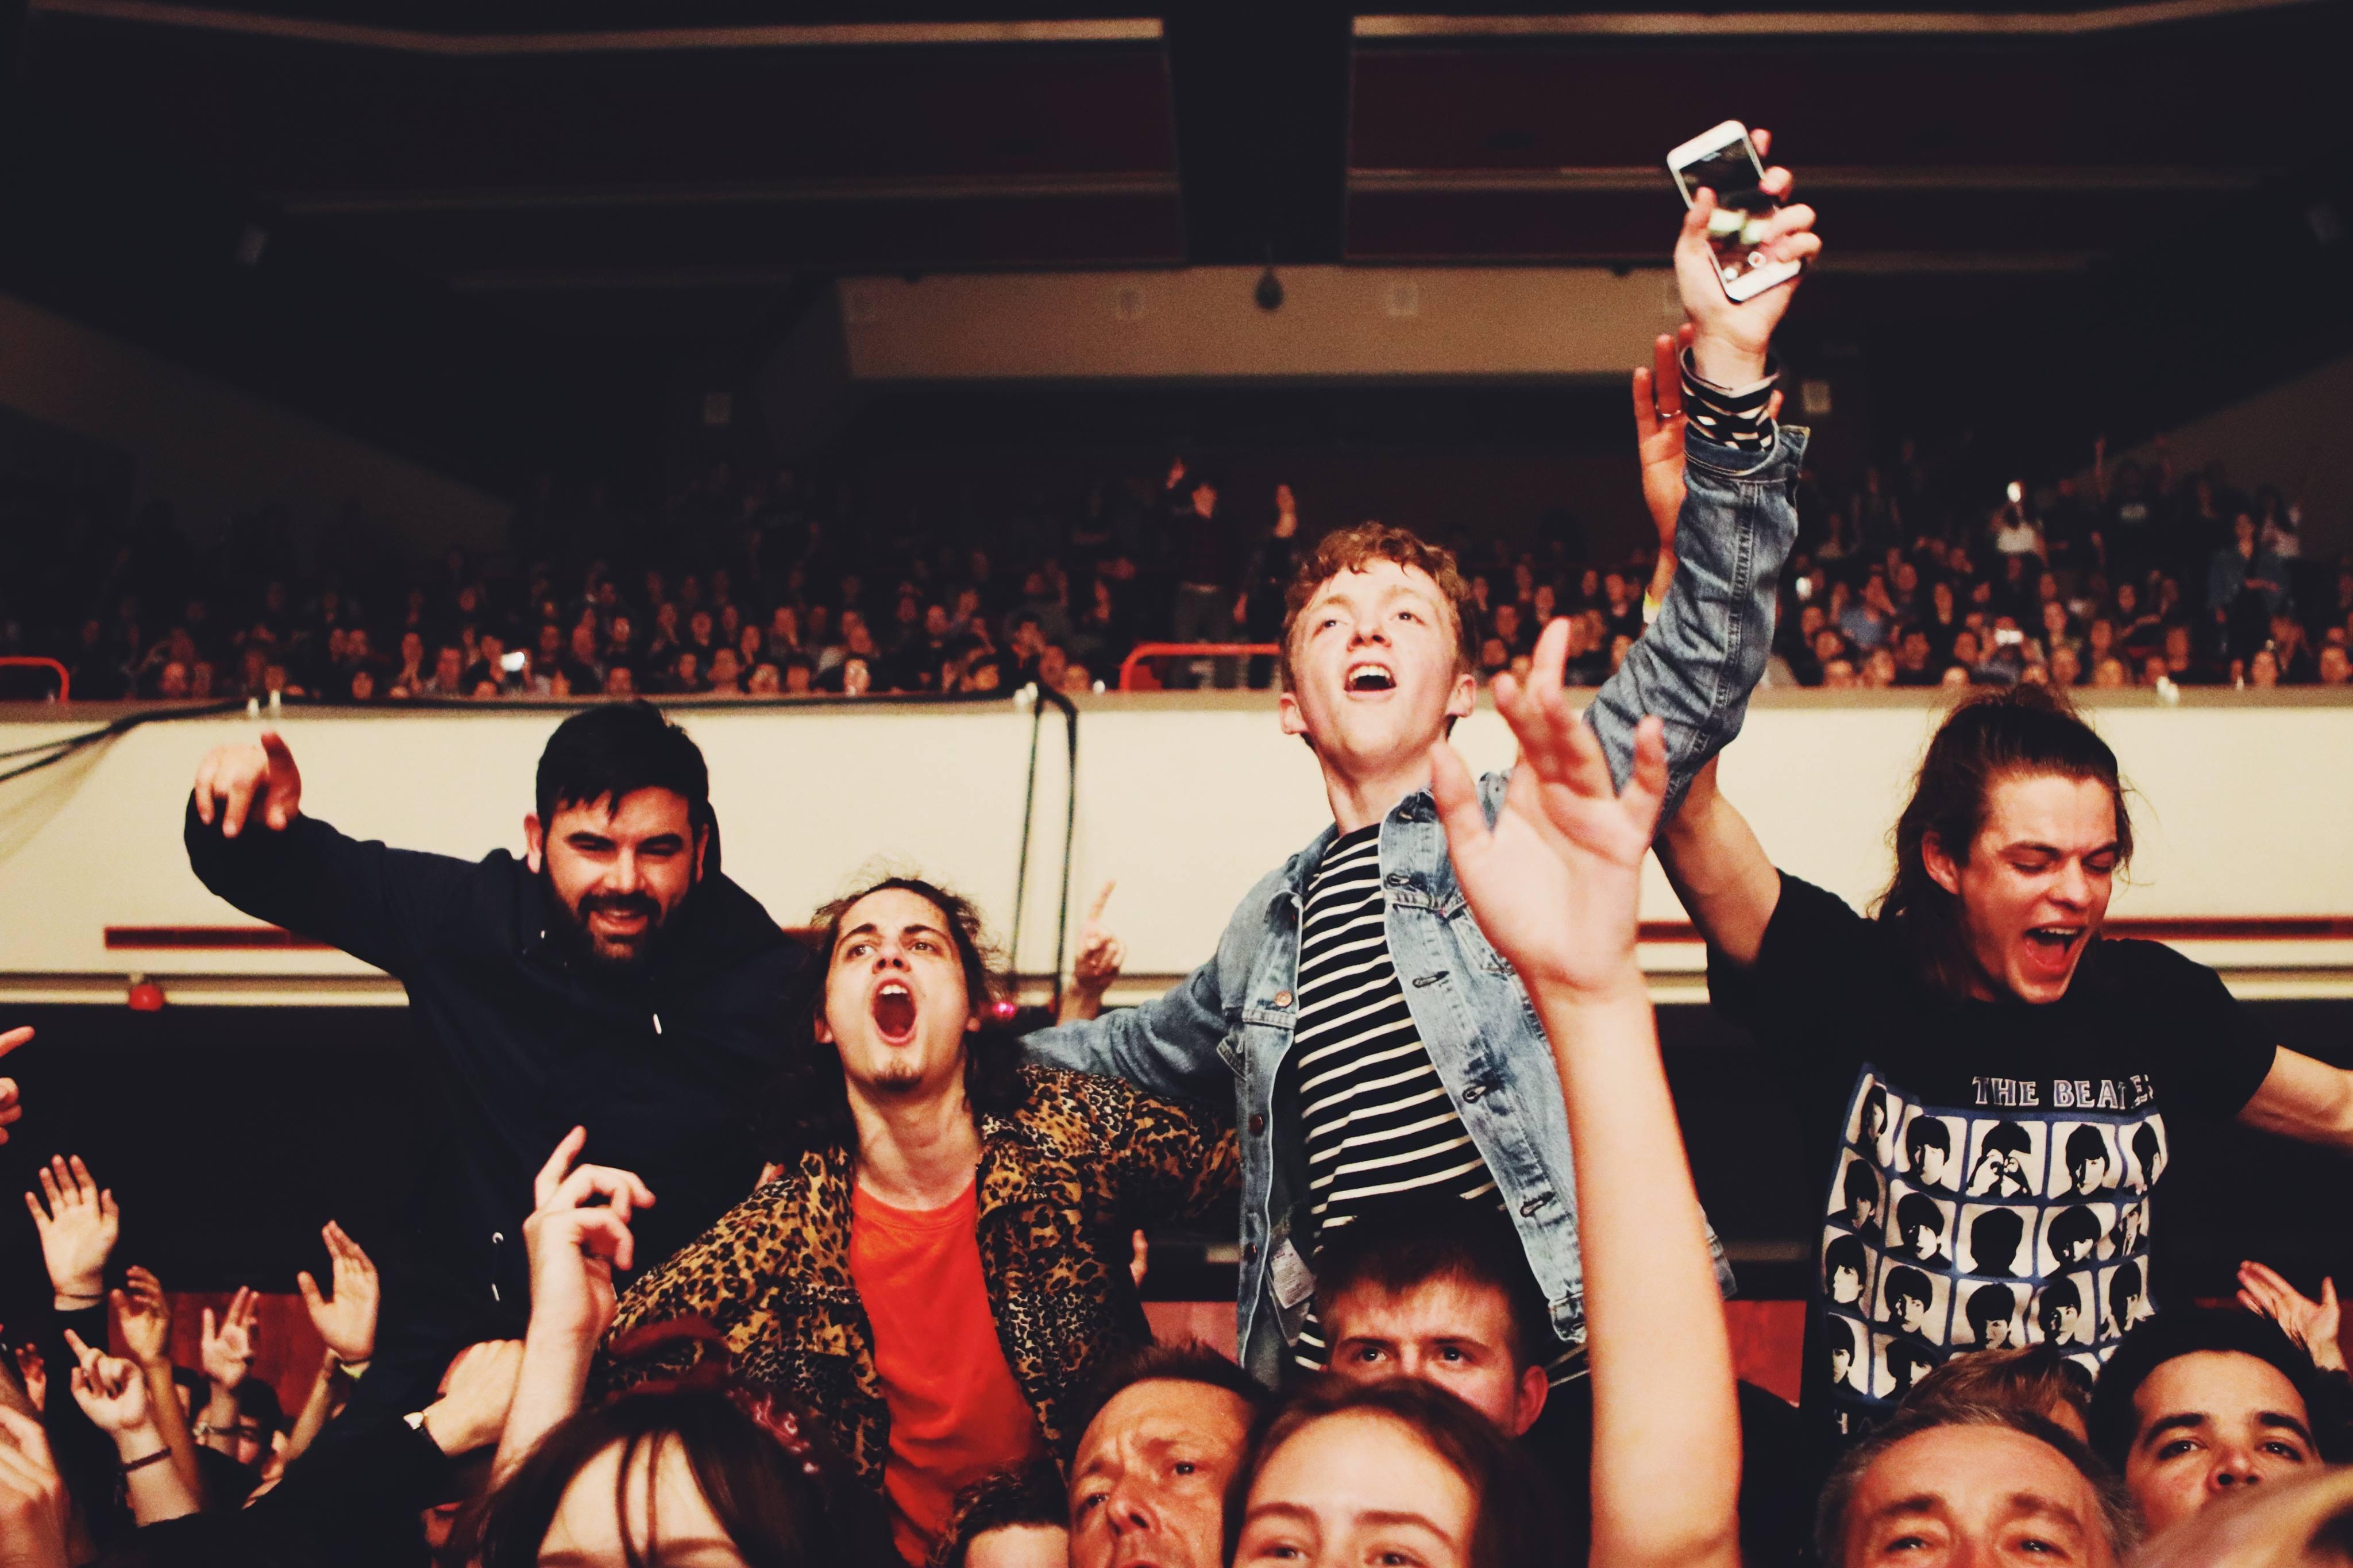 group people cheering inside the stadium